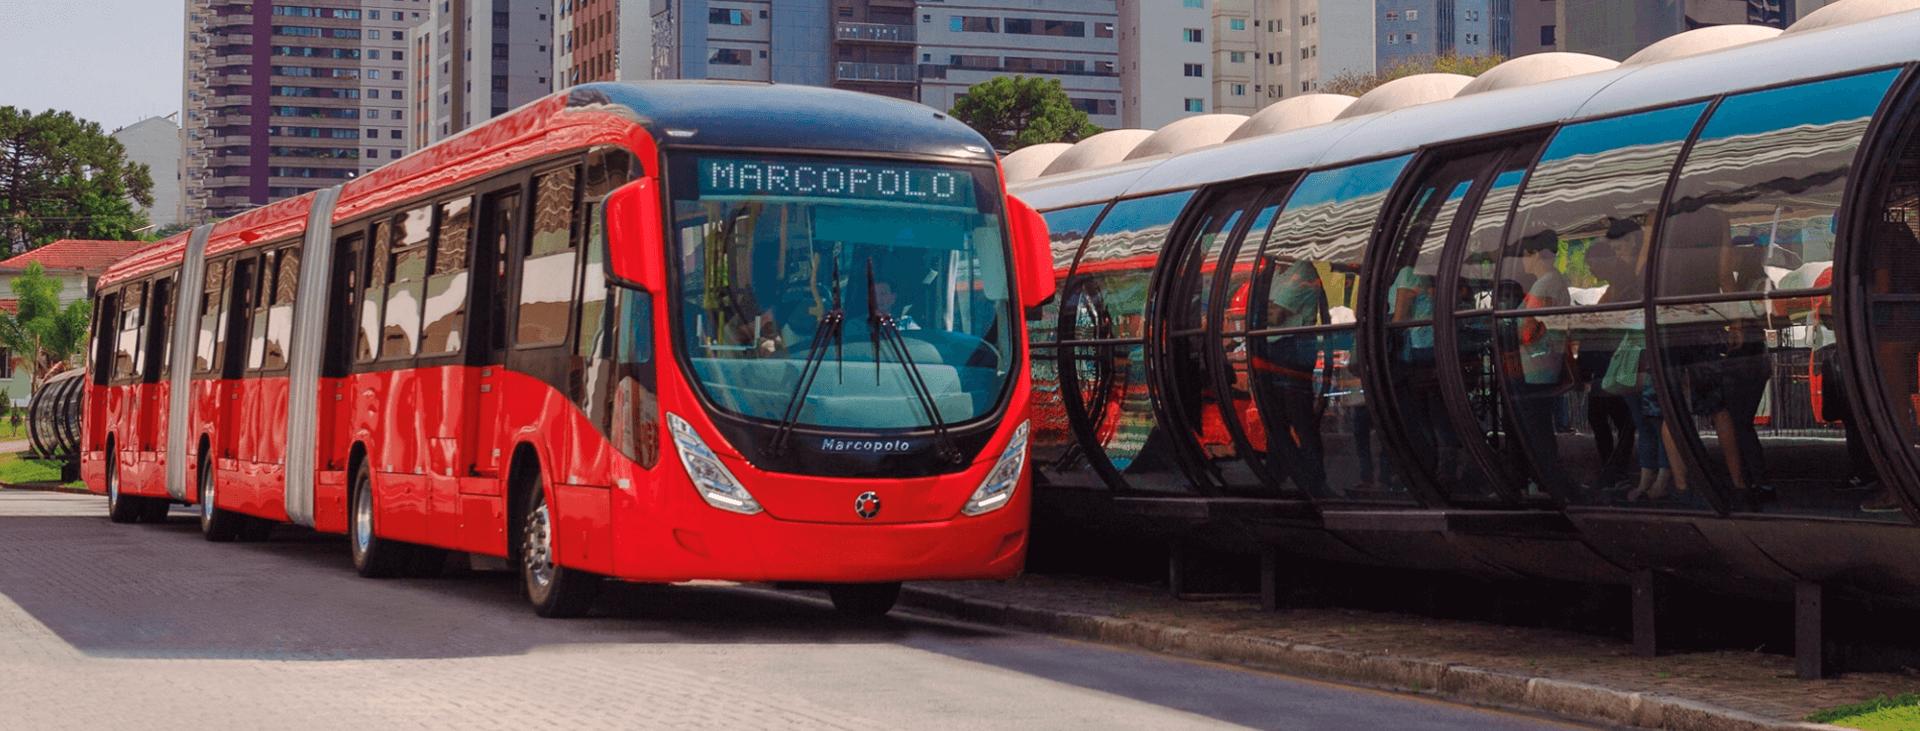 transporte urbano viale